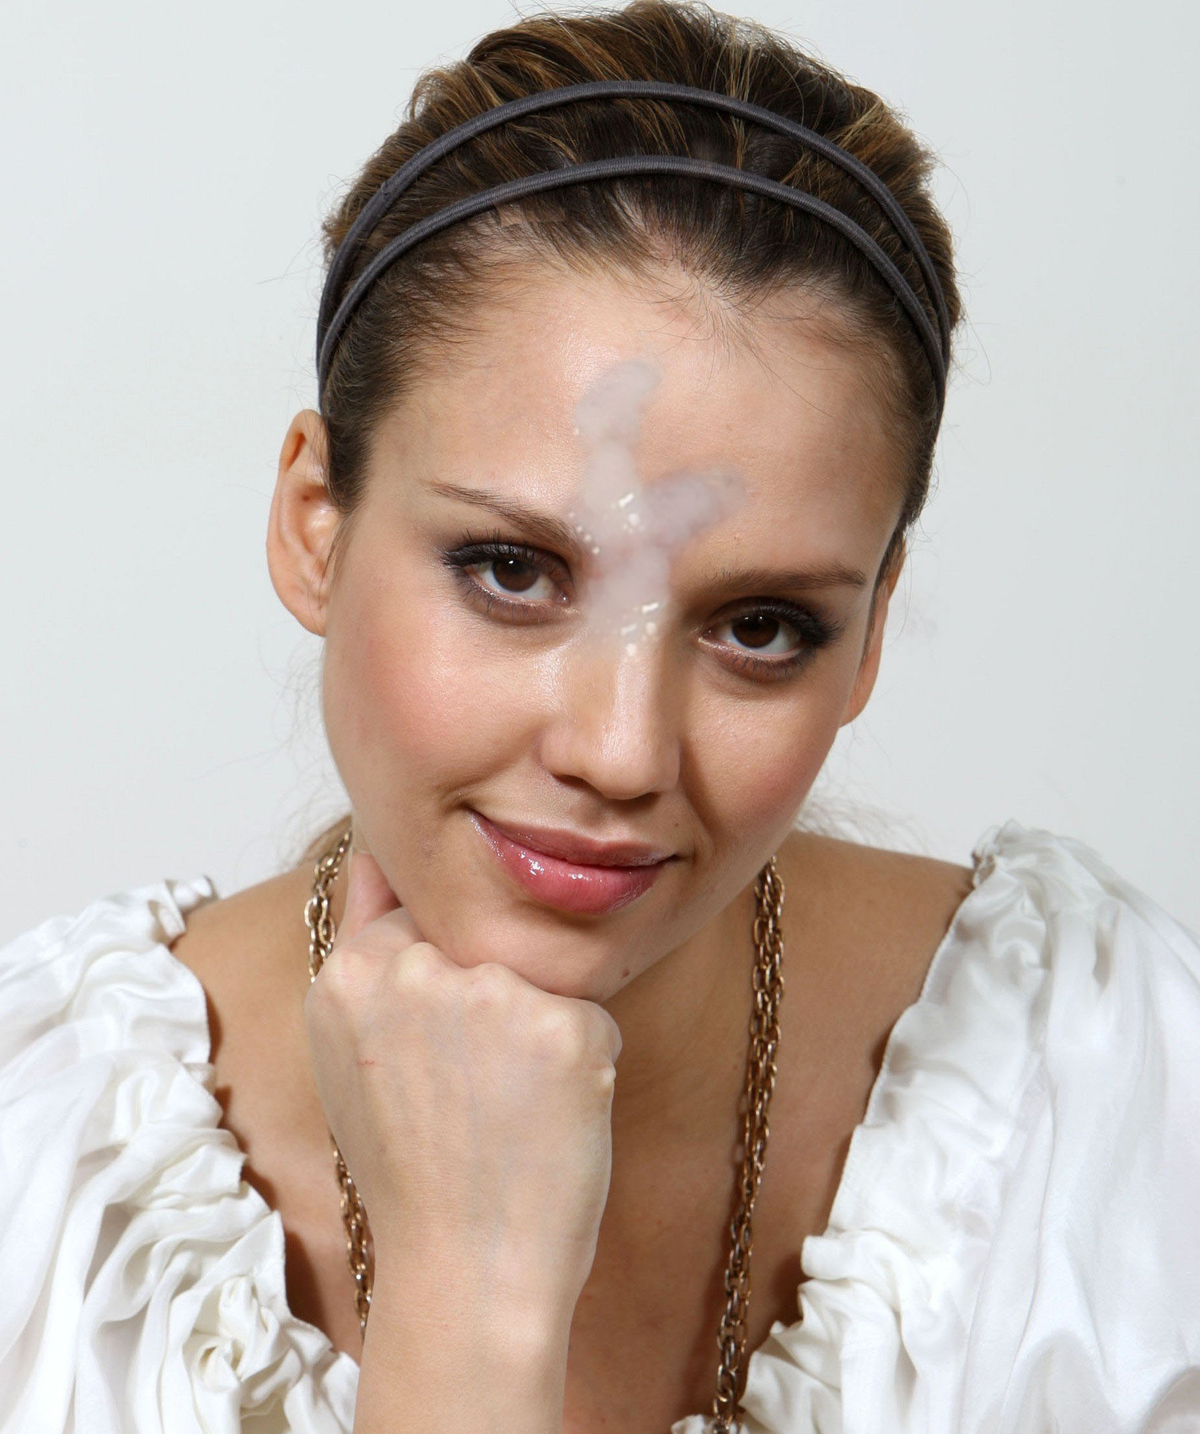 Celebrity Facial Cumshots 41